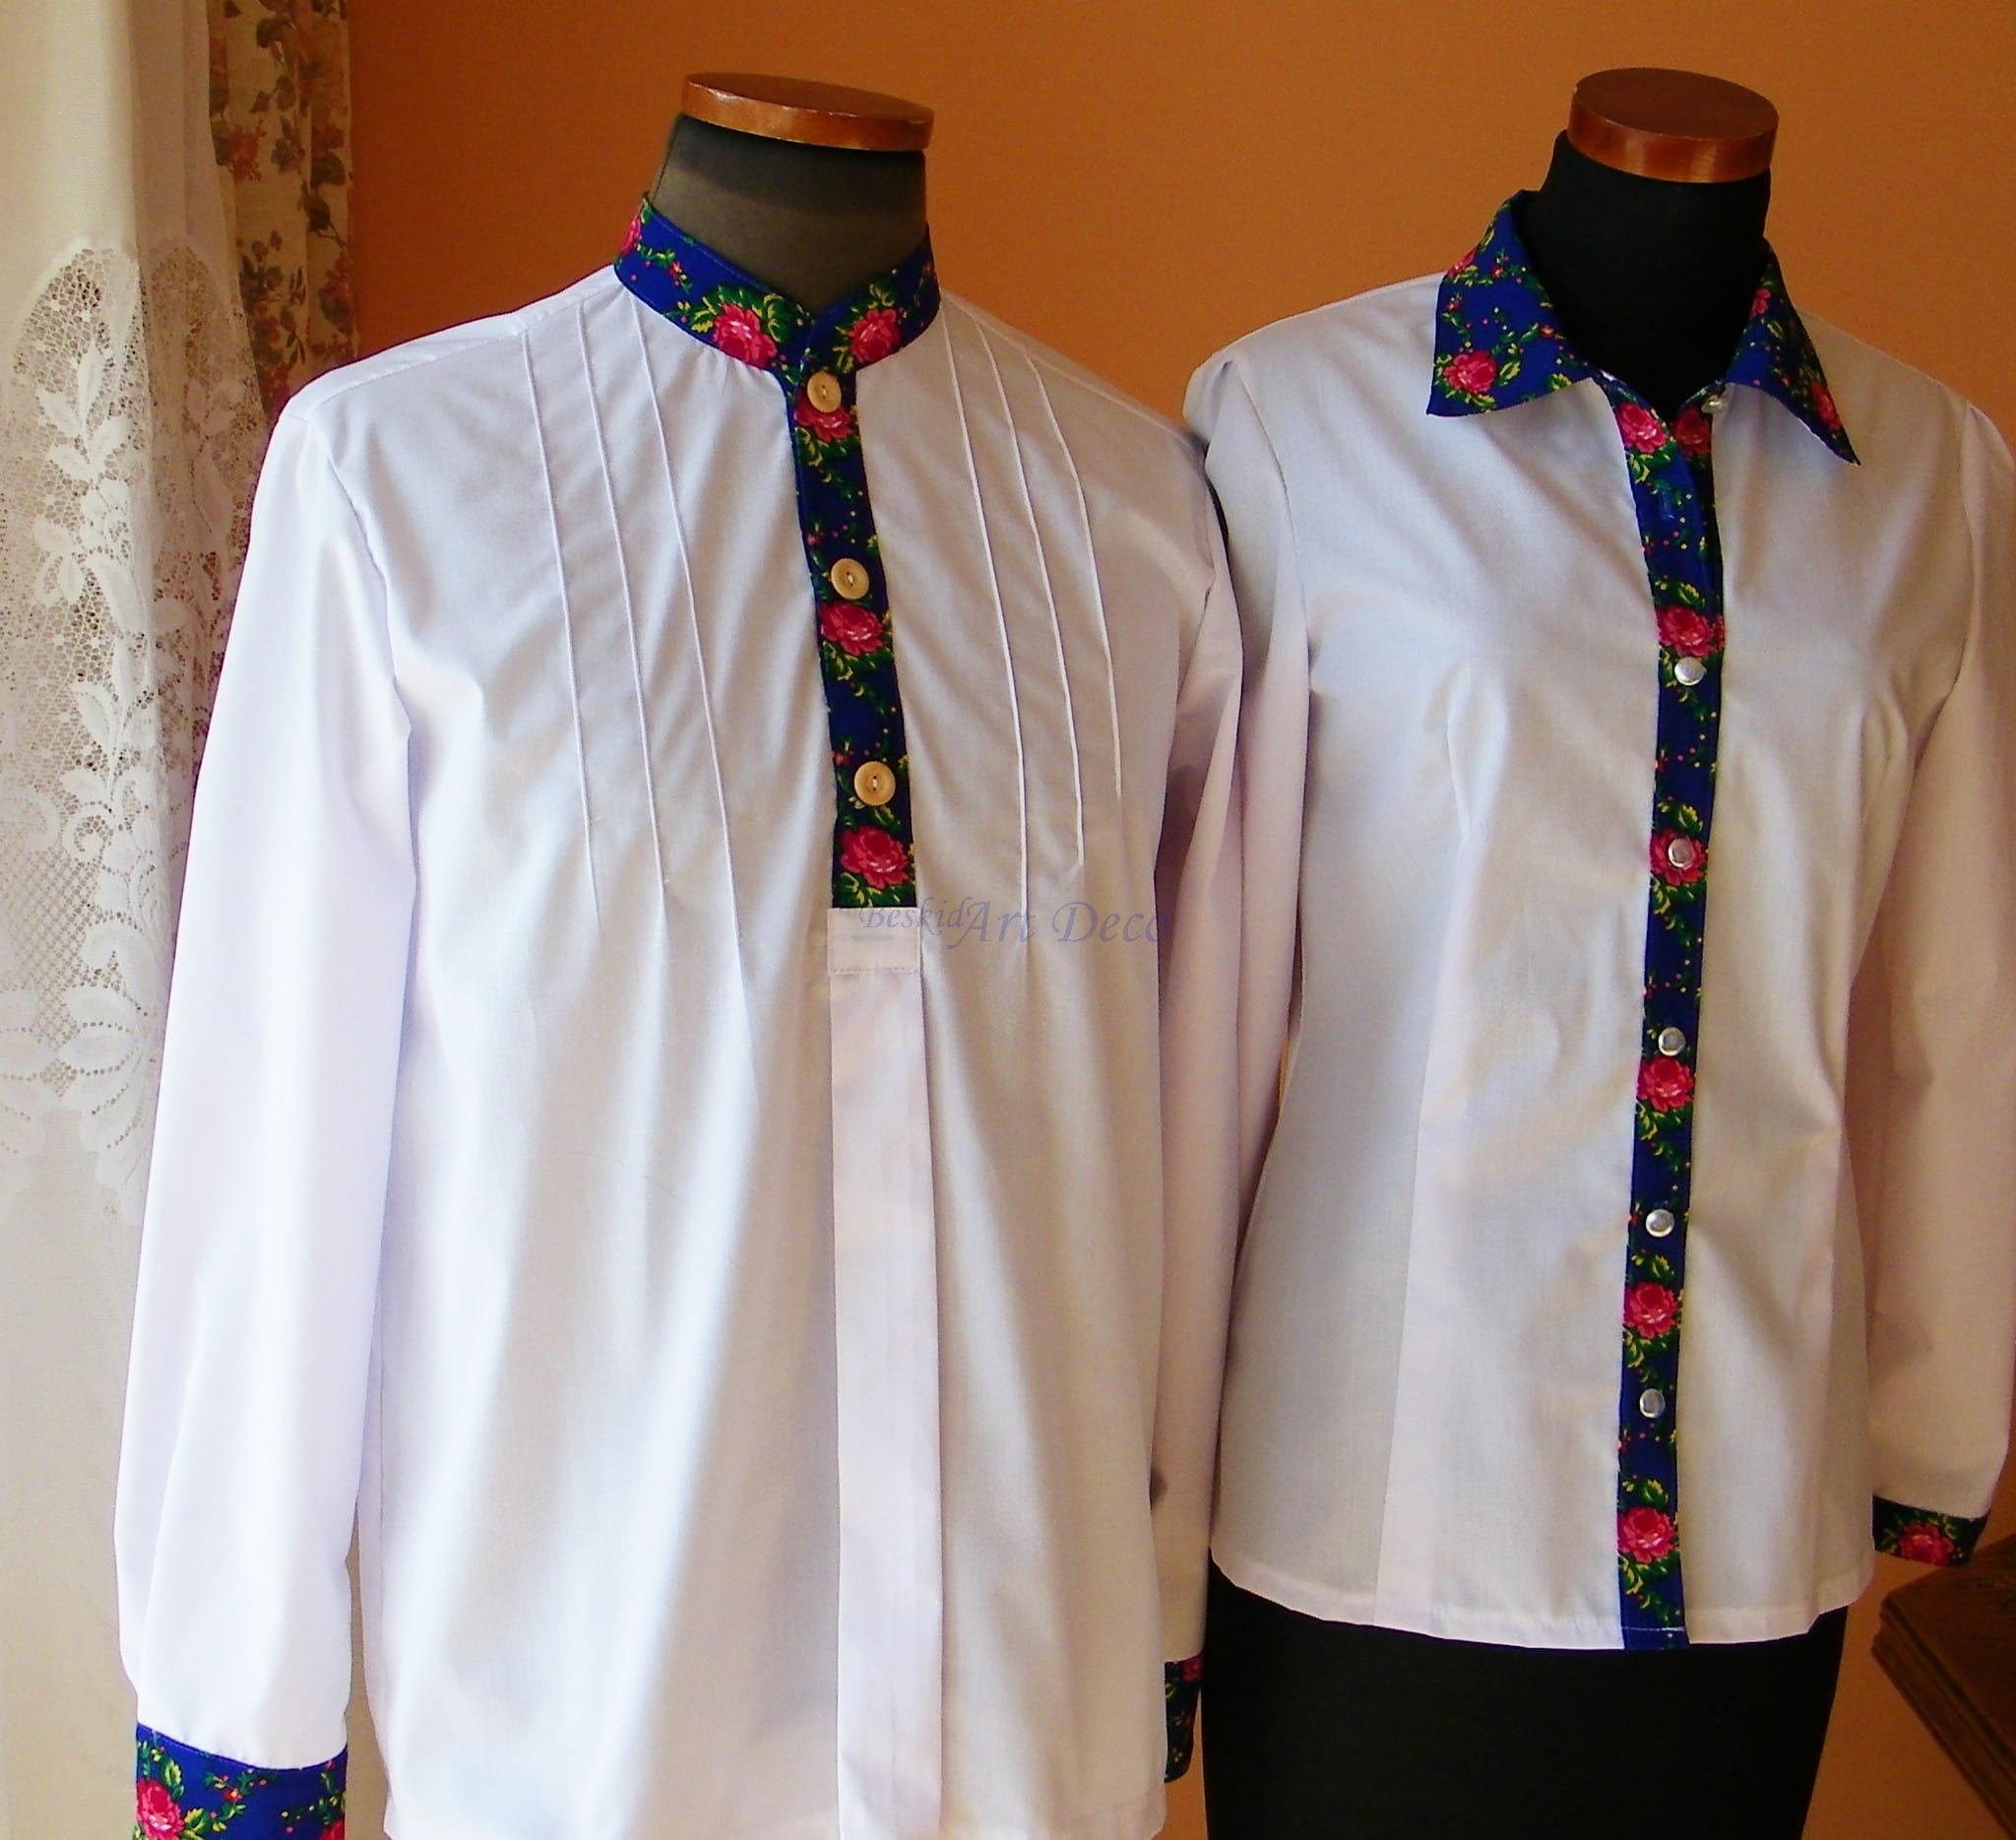 Koszula damska i męska do restauracji Beskid Art Deco  hCJIk